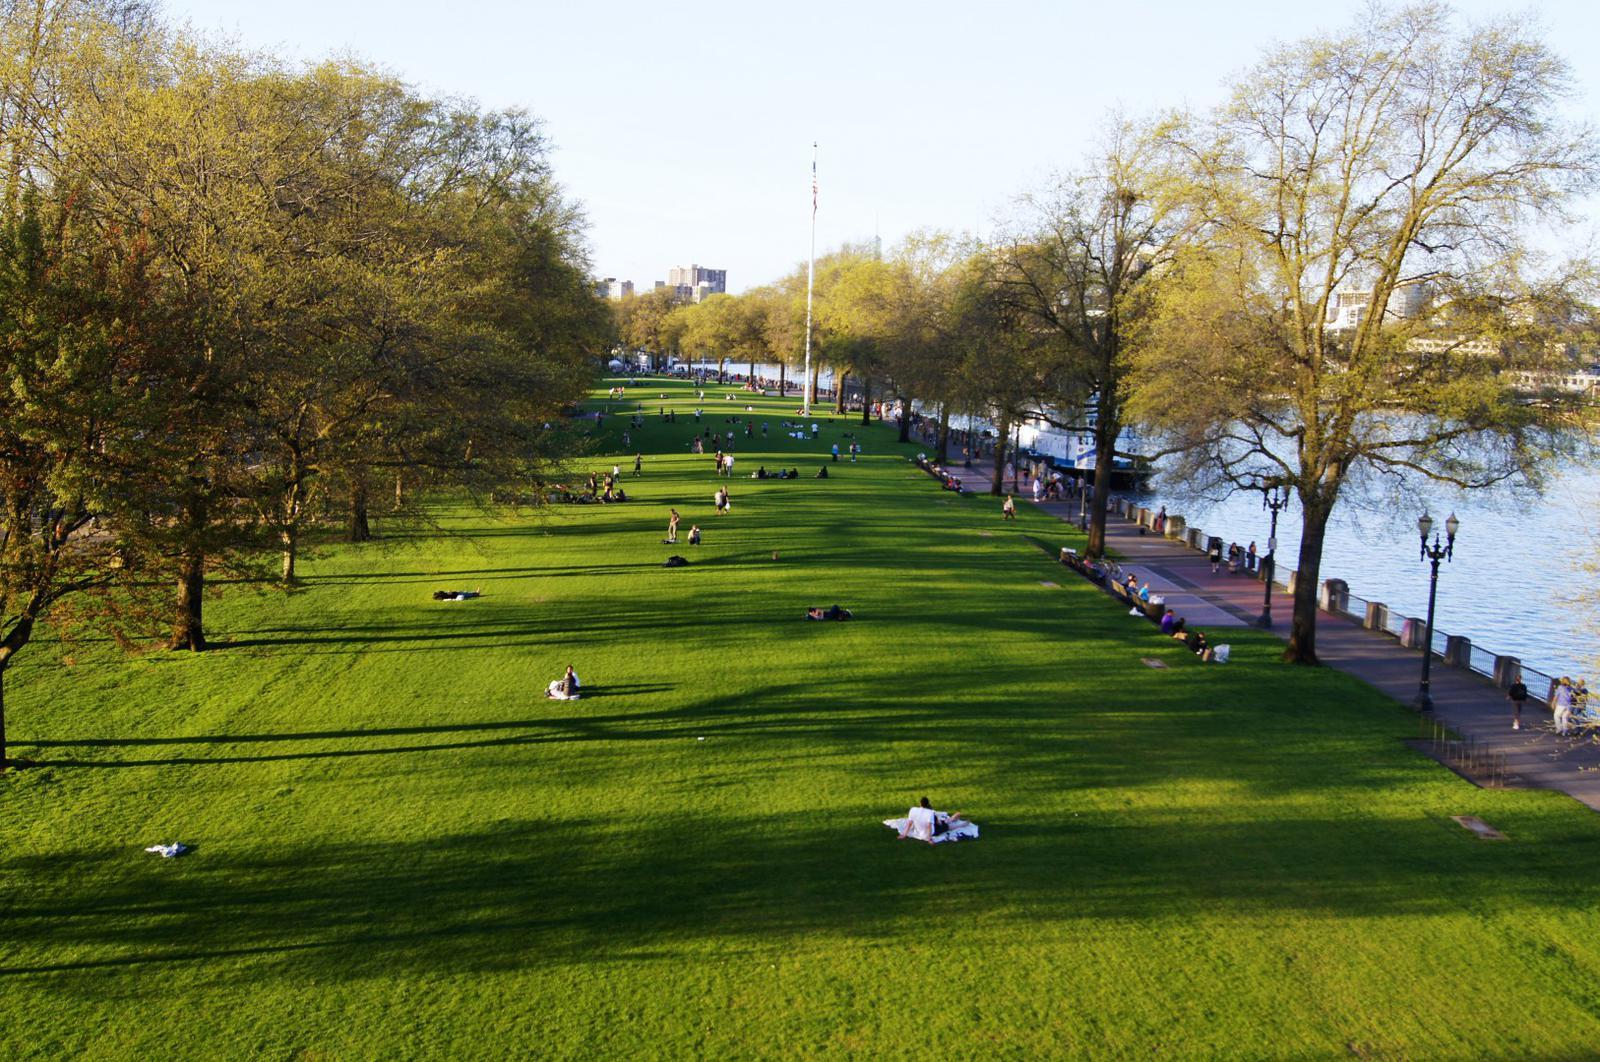 Waterfront Park from Morrison bridge